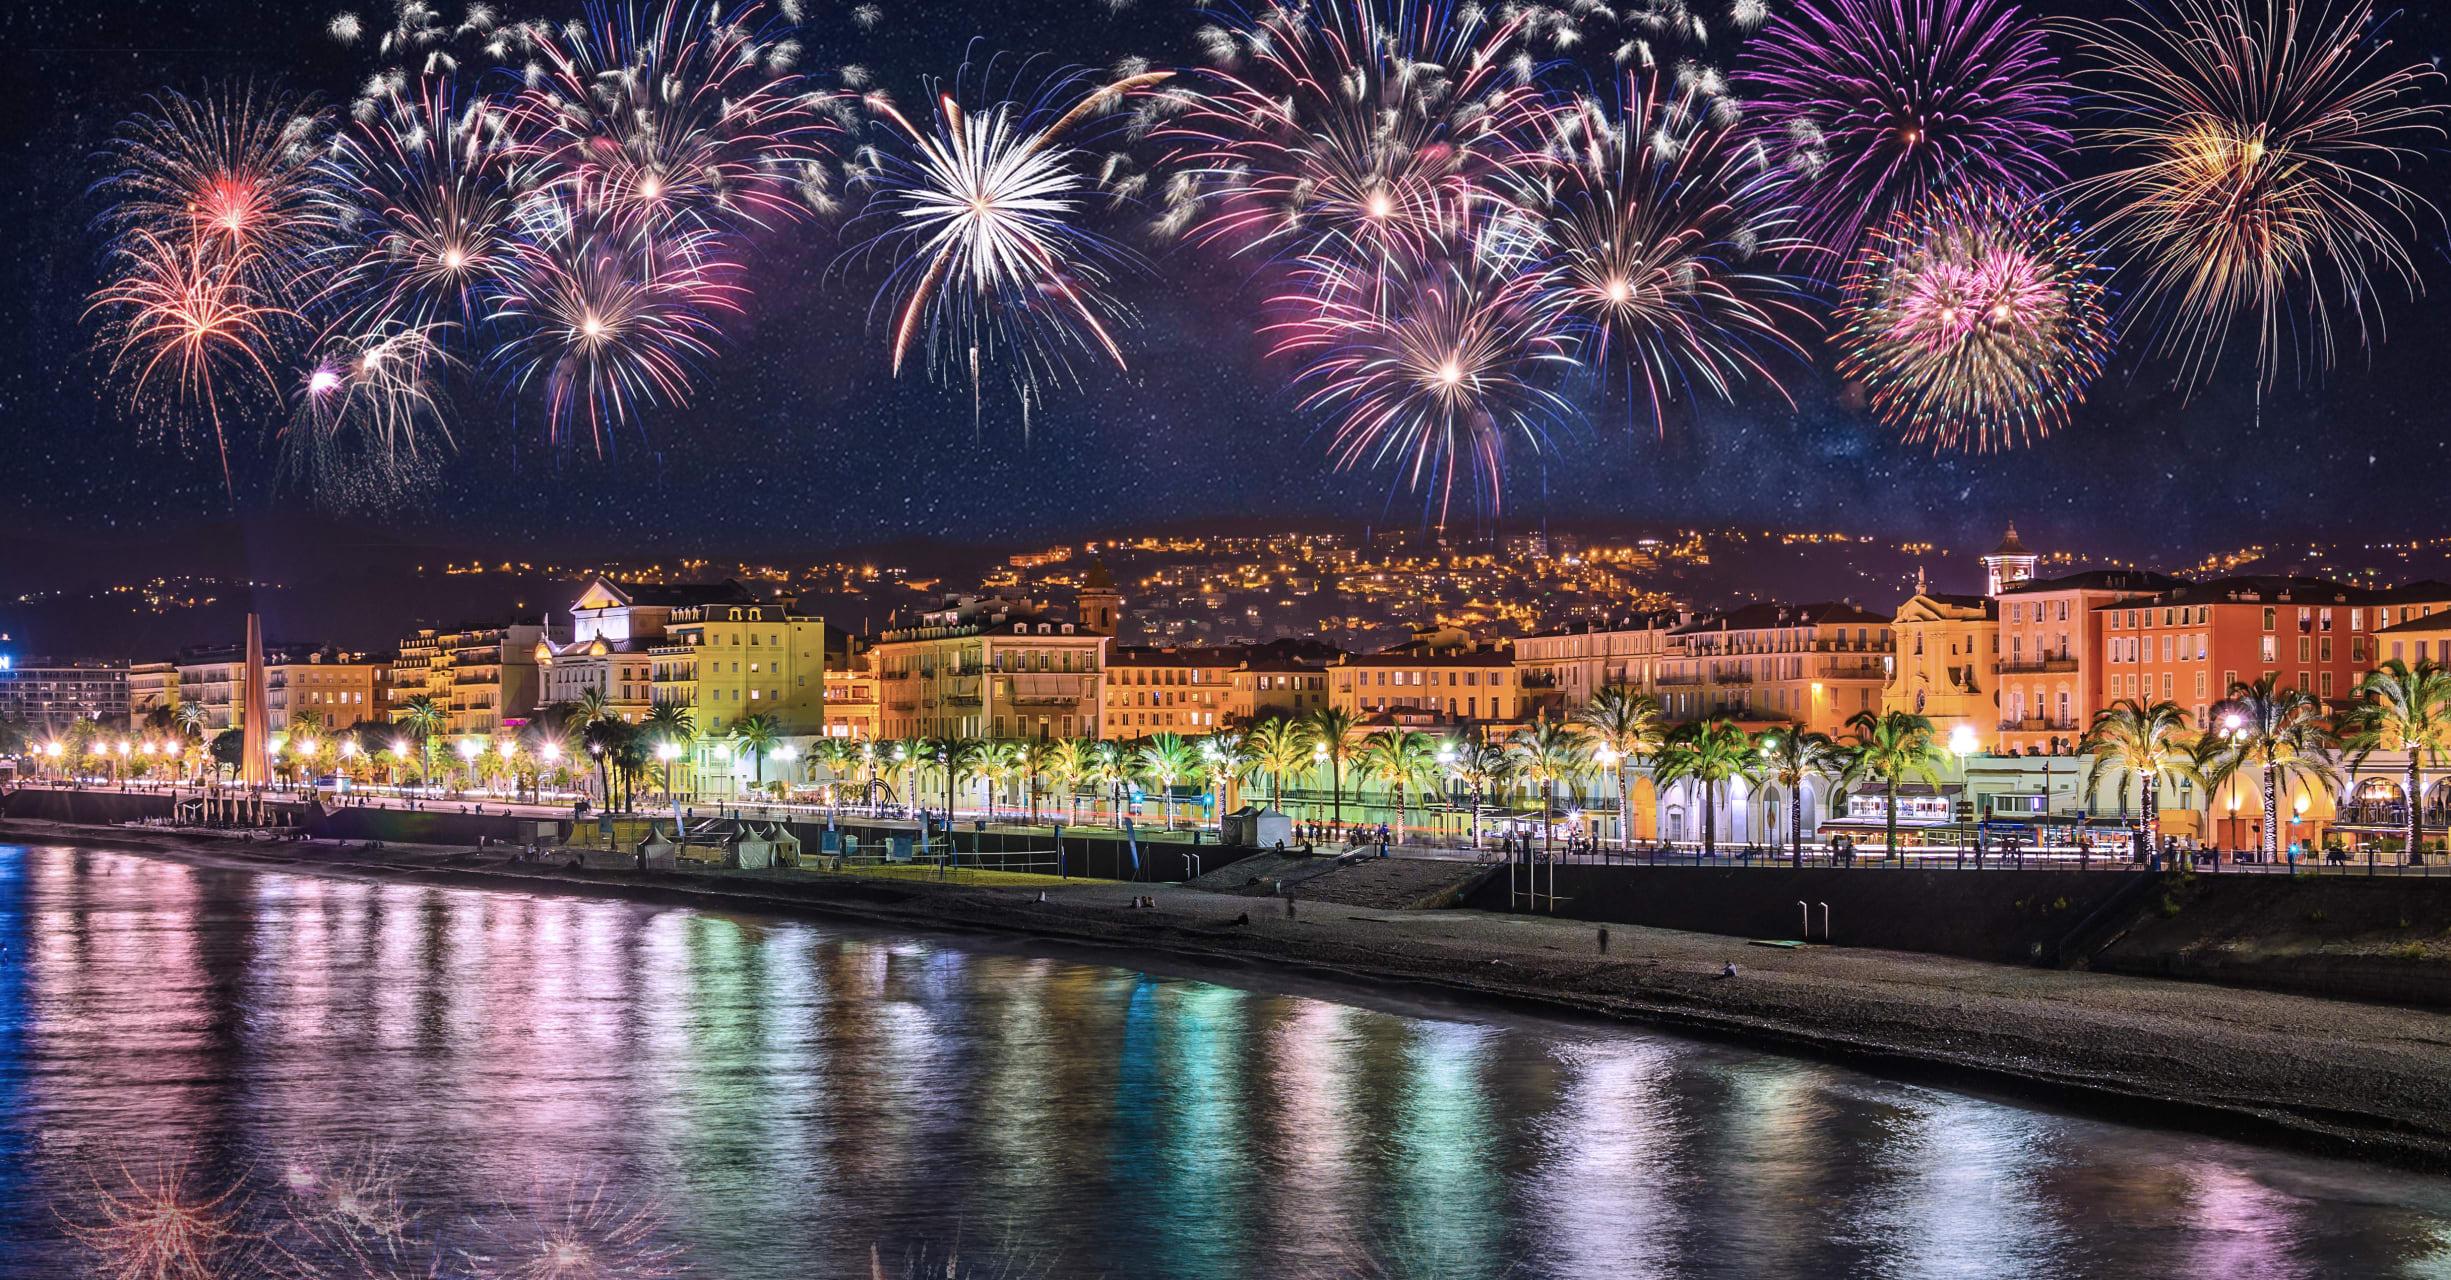 French Riviera - Beaulieu explodes, Summer Fireworks!